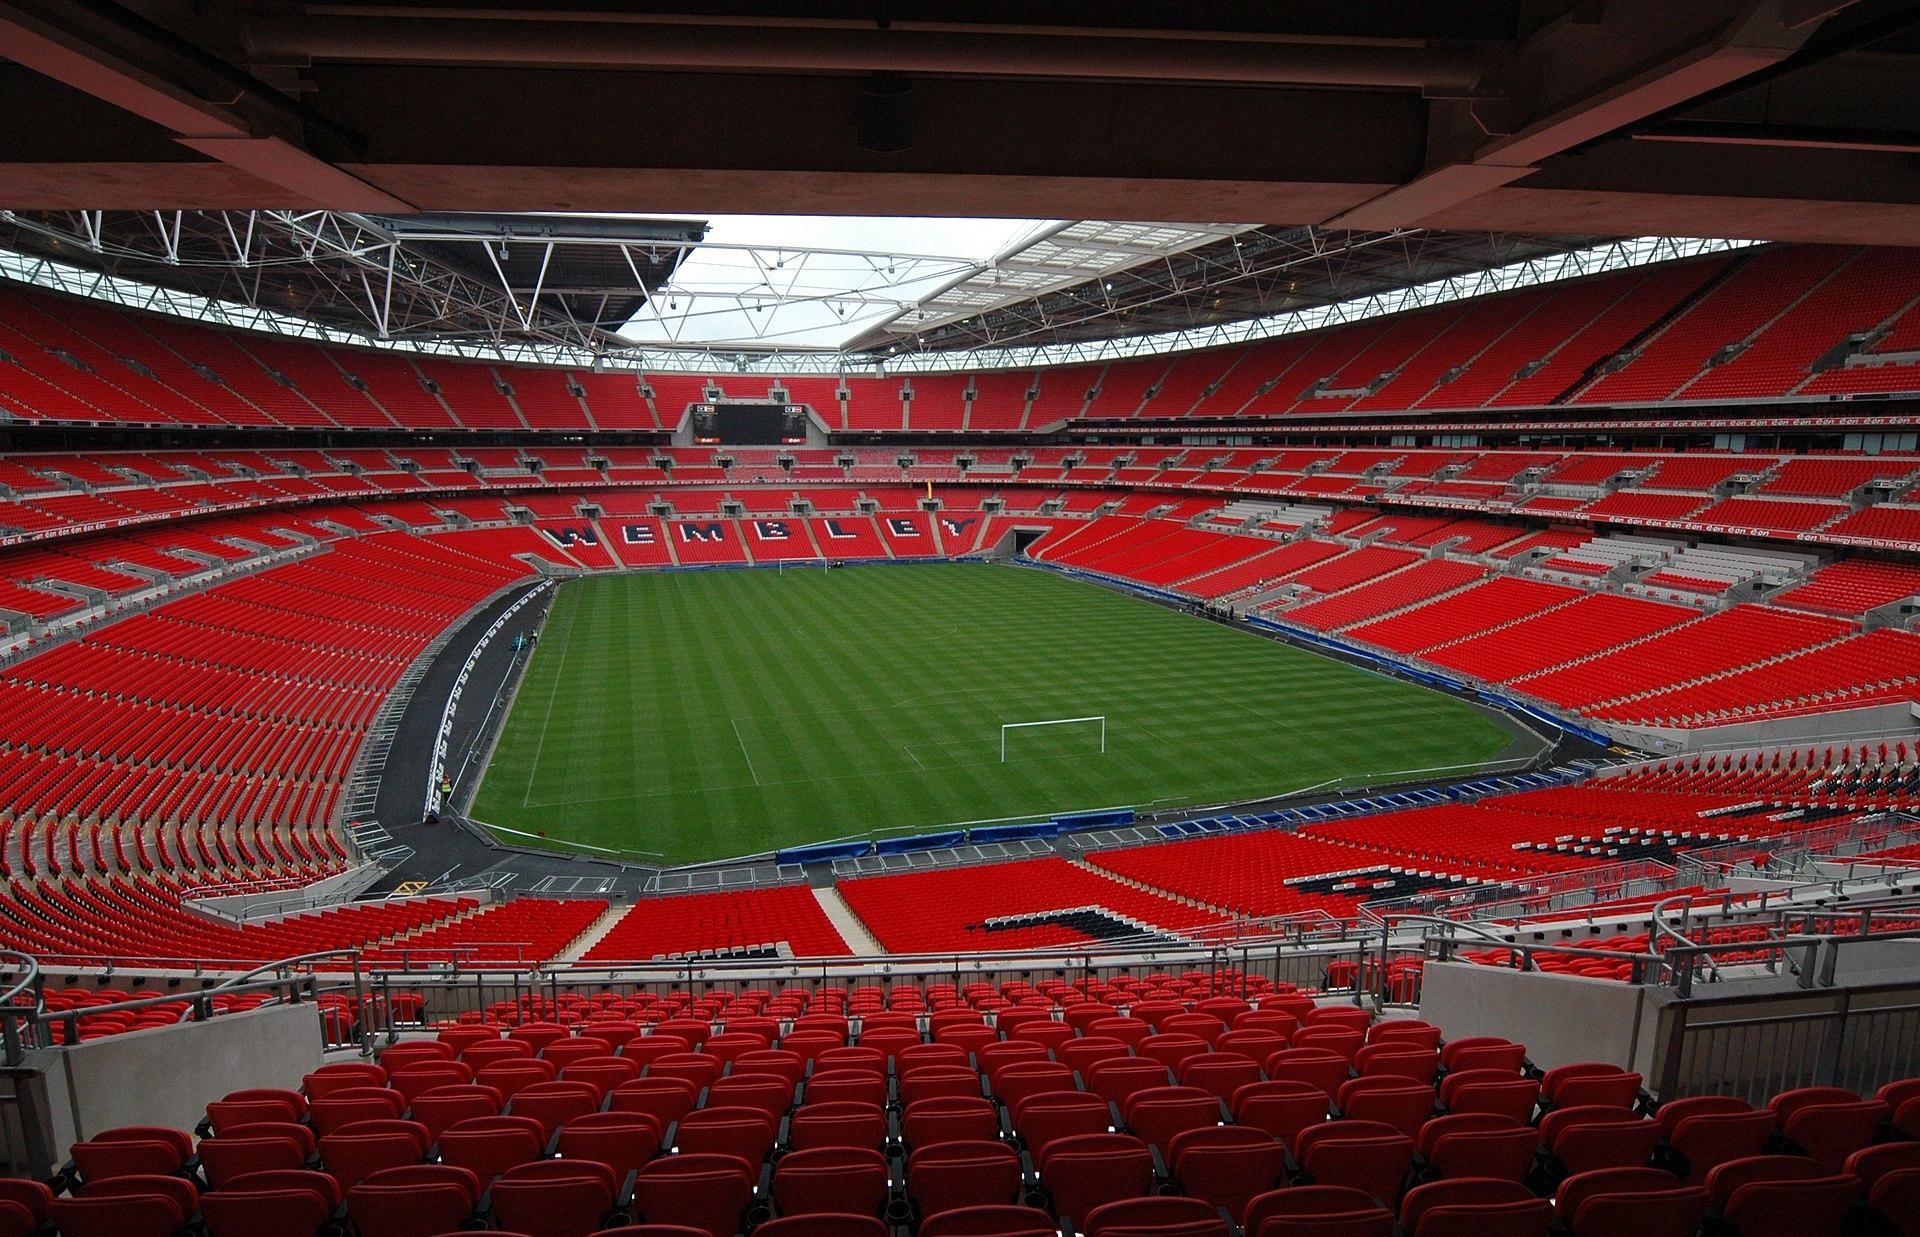 Football Stadiums - Wembley Stadium, London